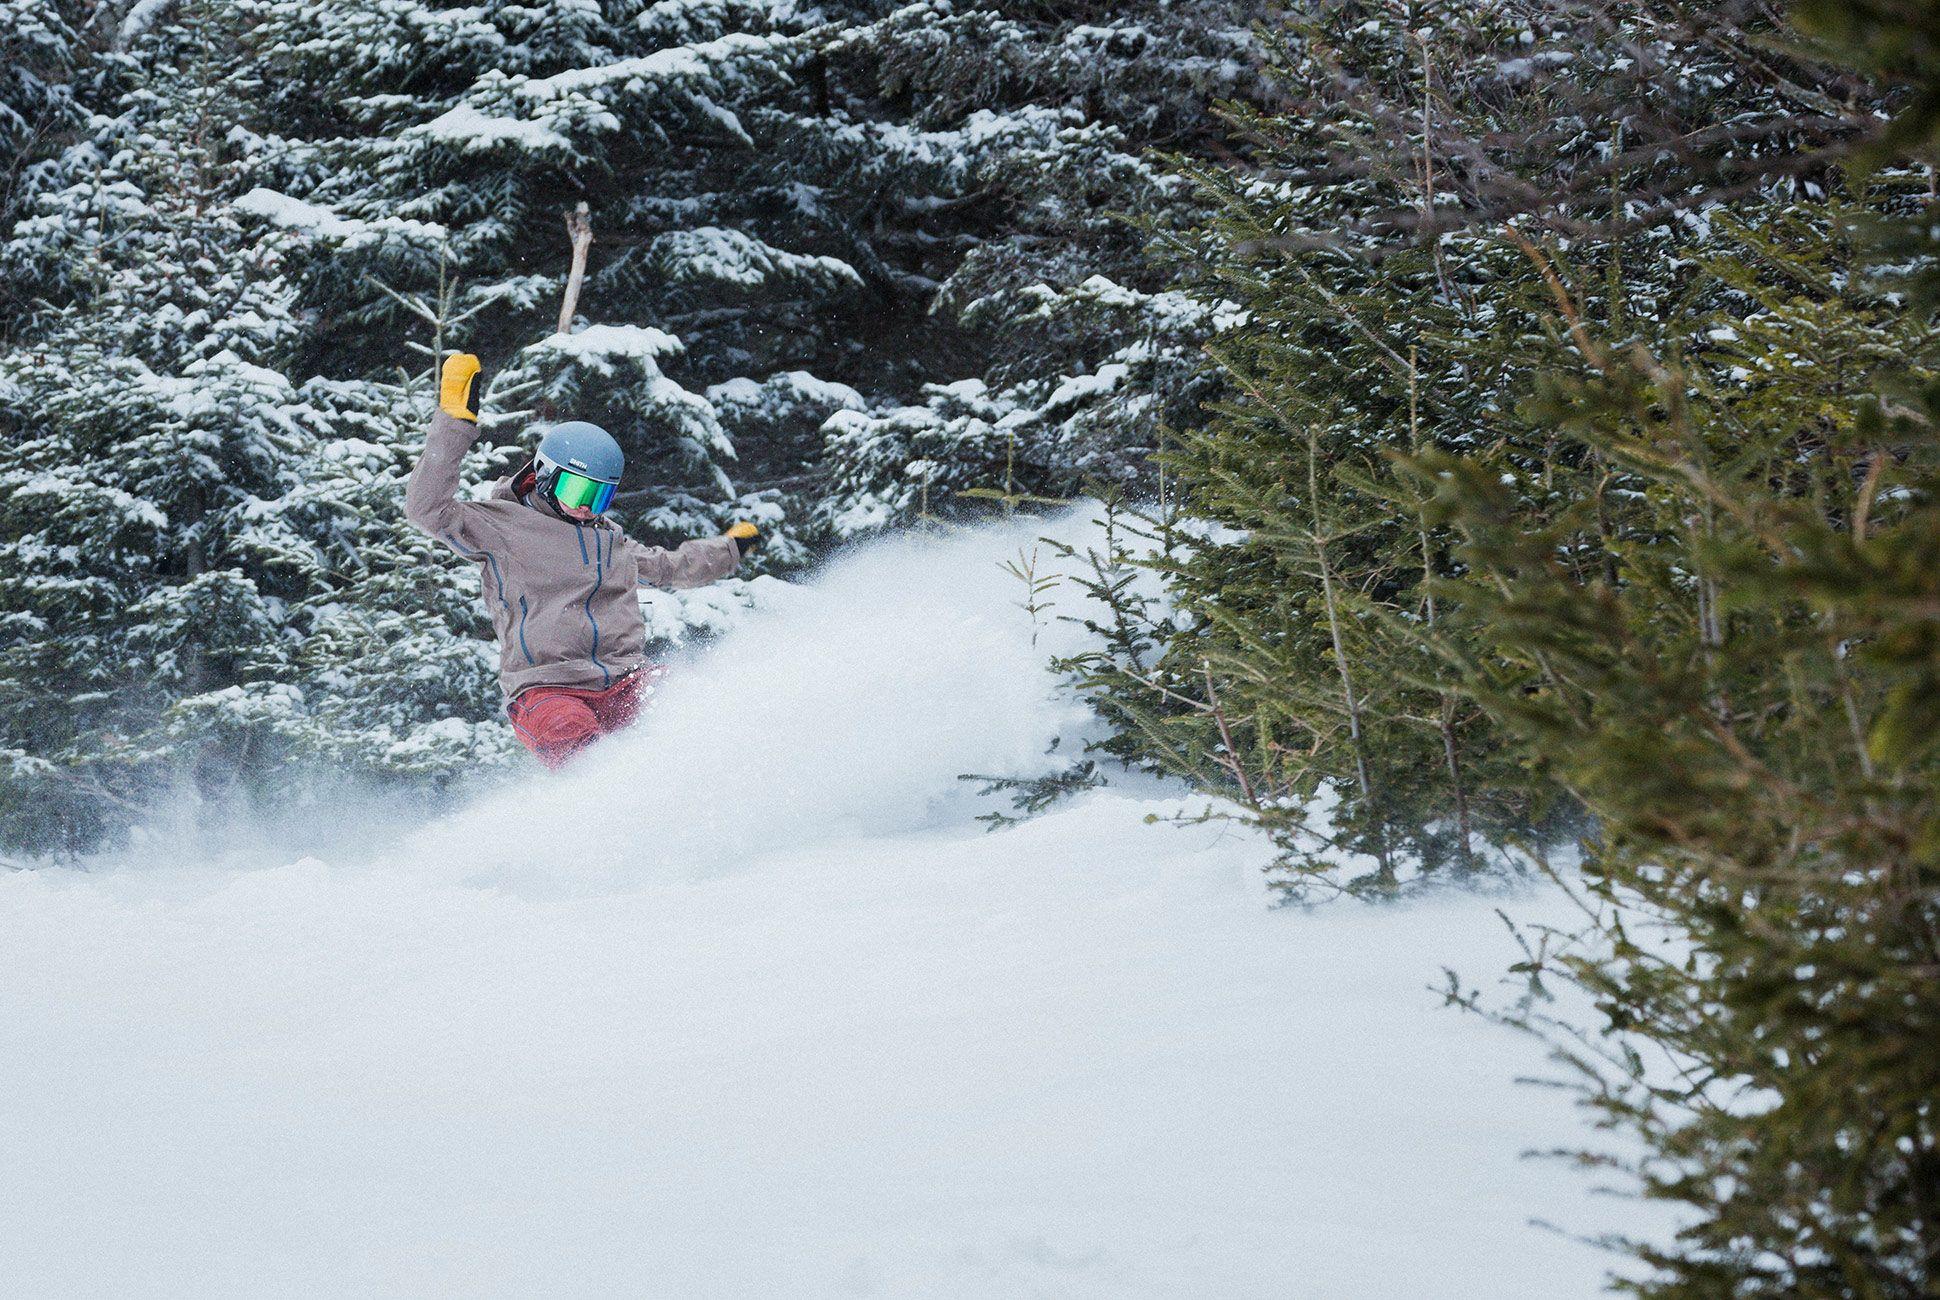 ultimate-ski-and-snow-gear-patrol-stio-slide-1